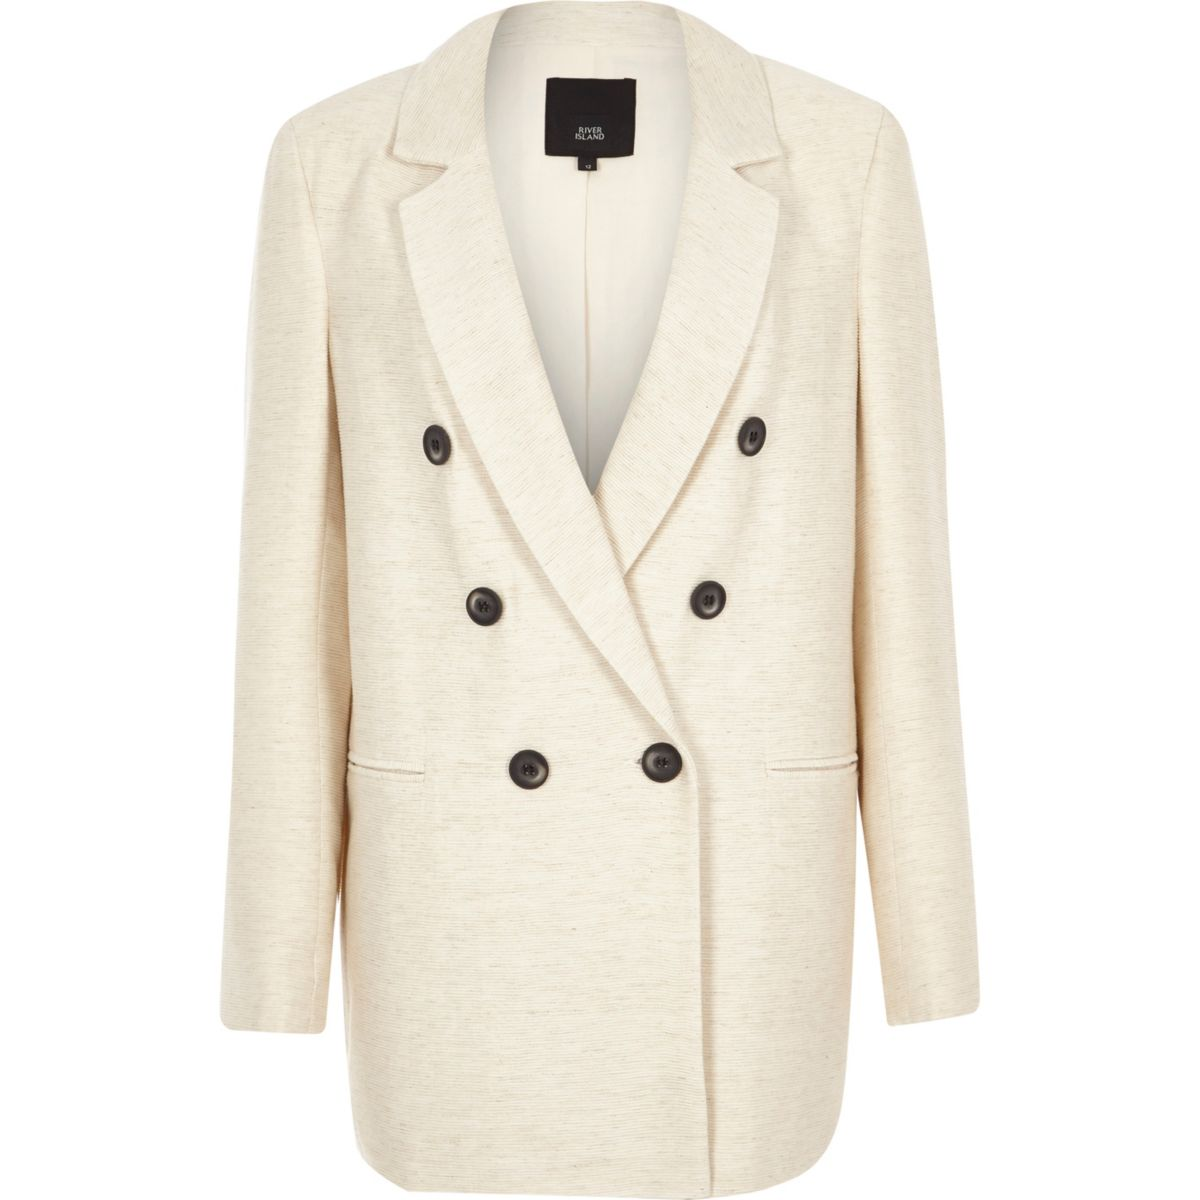 River Island blazer, $136